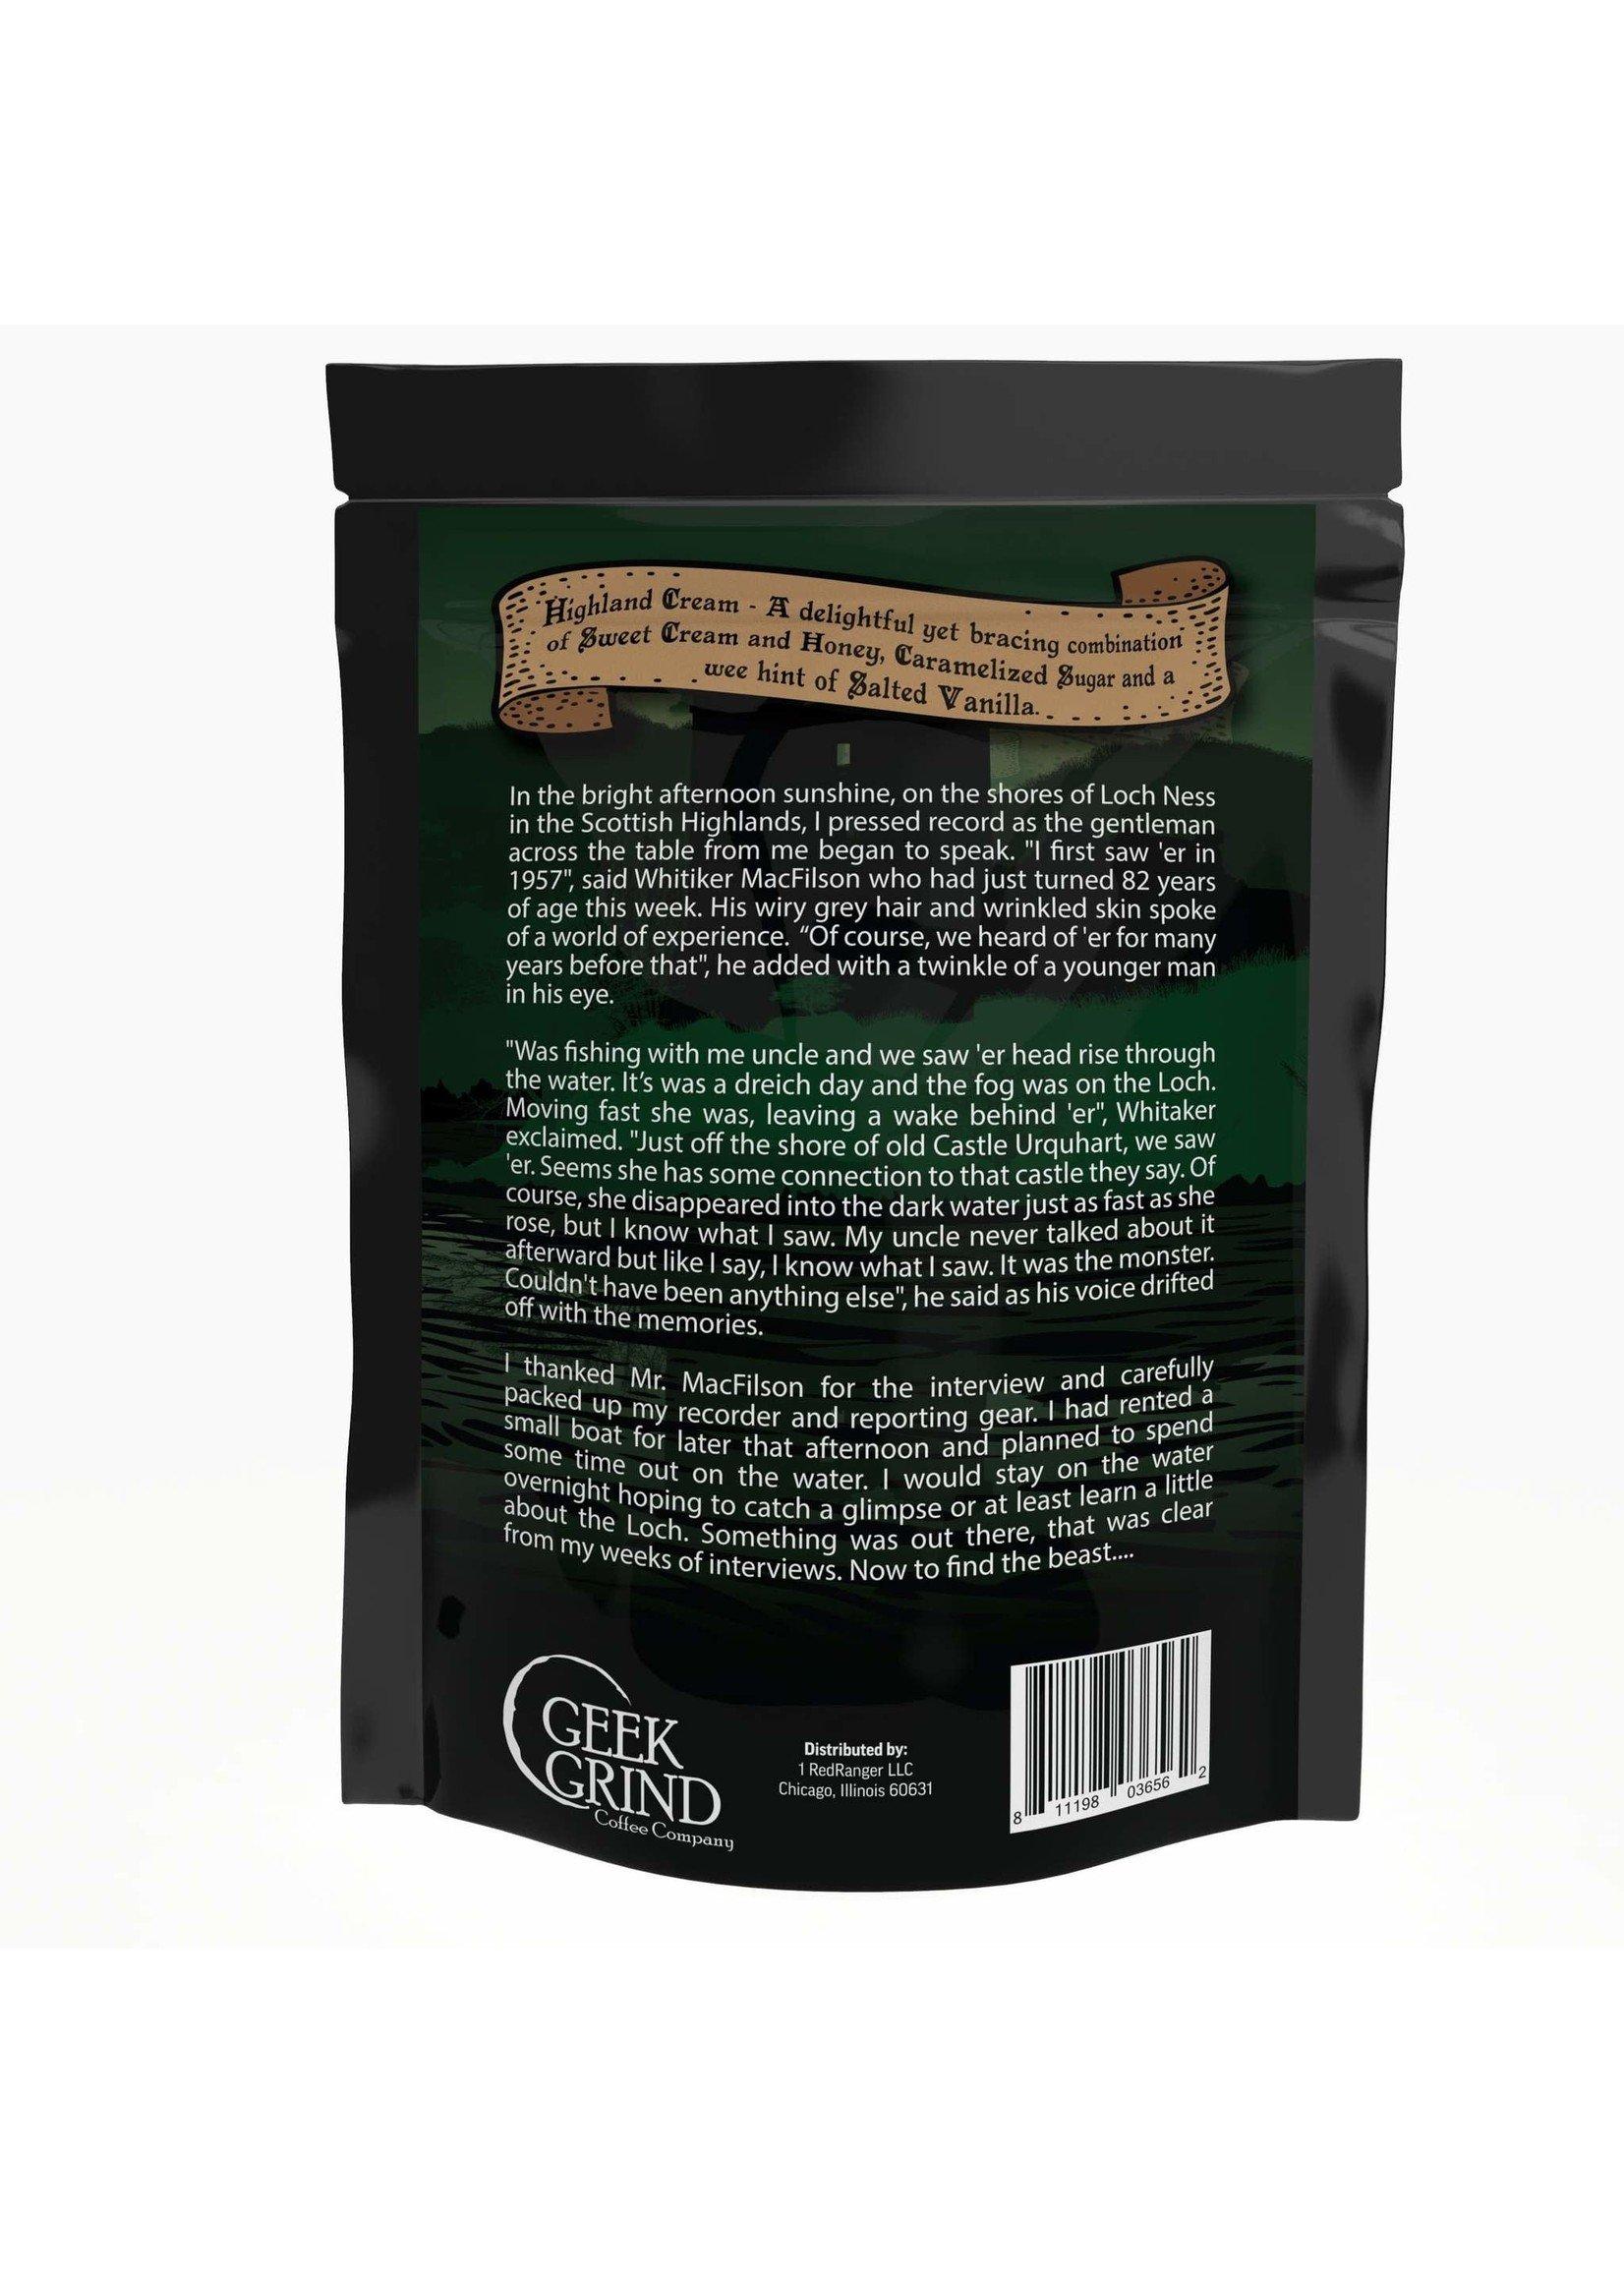 Geek Grind Legend of the Loch - Highland Cream Flavored Coffee - 12 oz. / Whole Bean